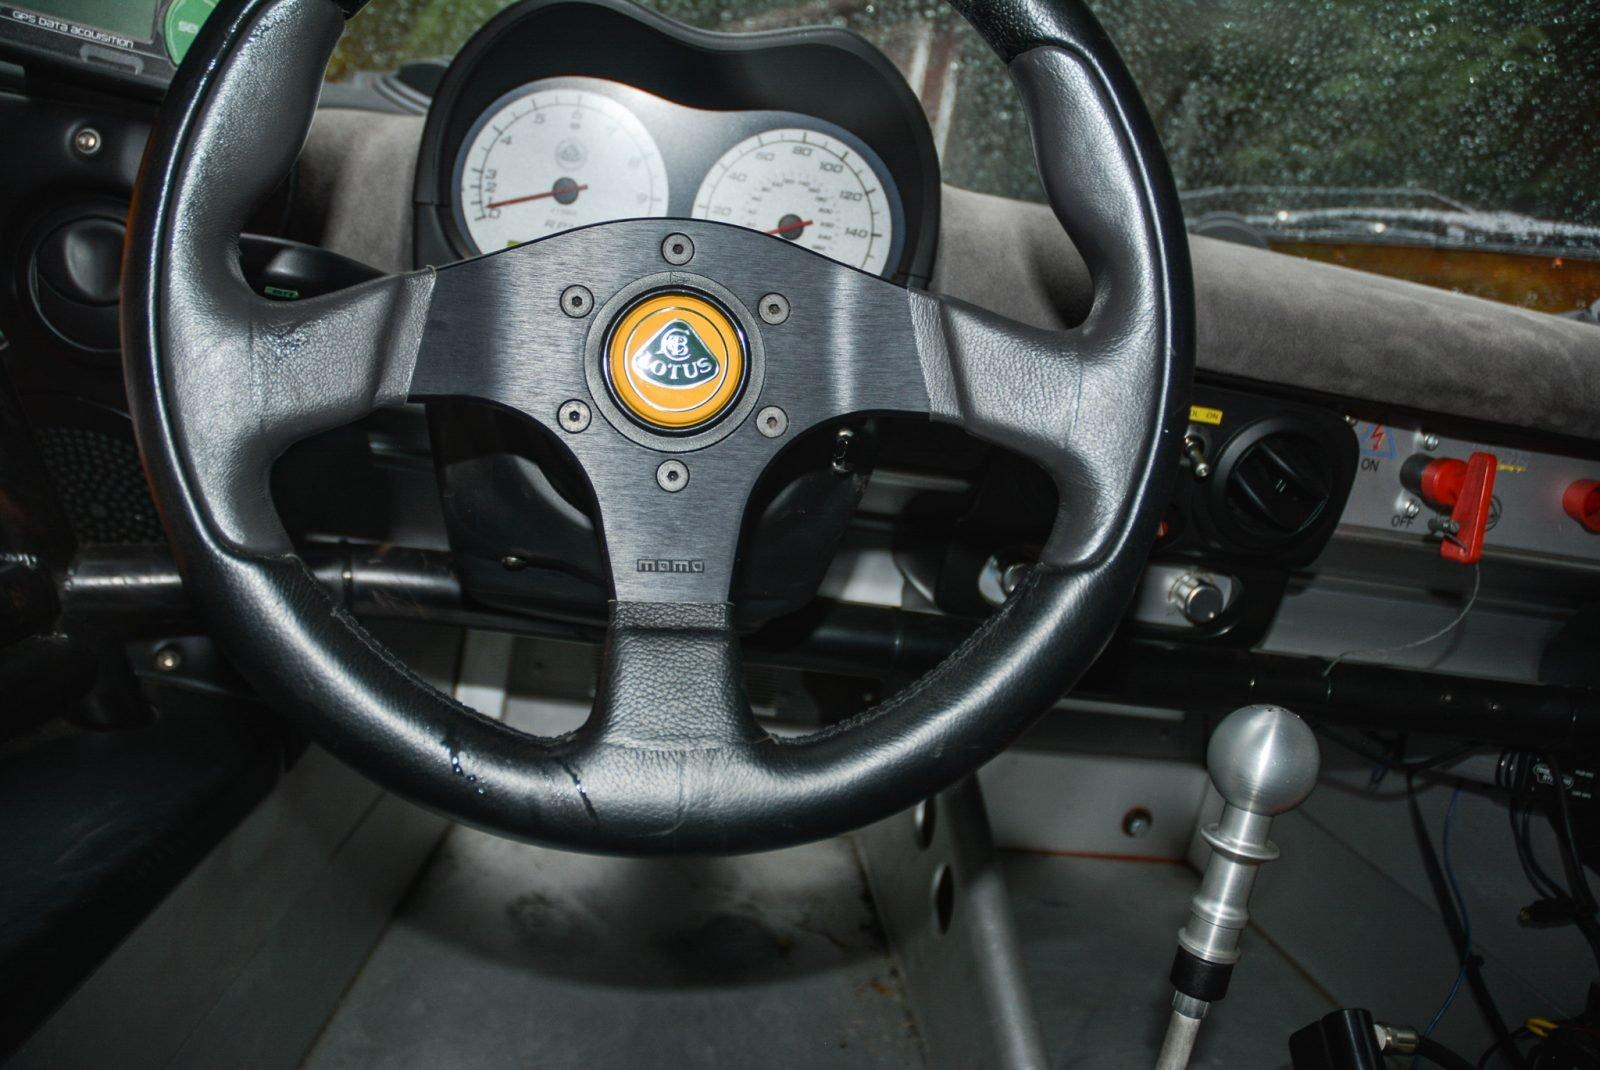 2006 Lotus Exige Cup 240 Factory Built Race Car FIA Rare $ob For Sale (picture 4 of 6)